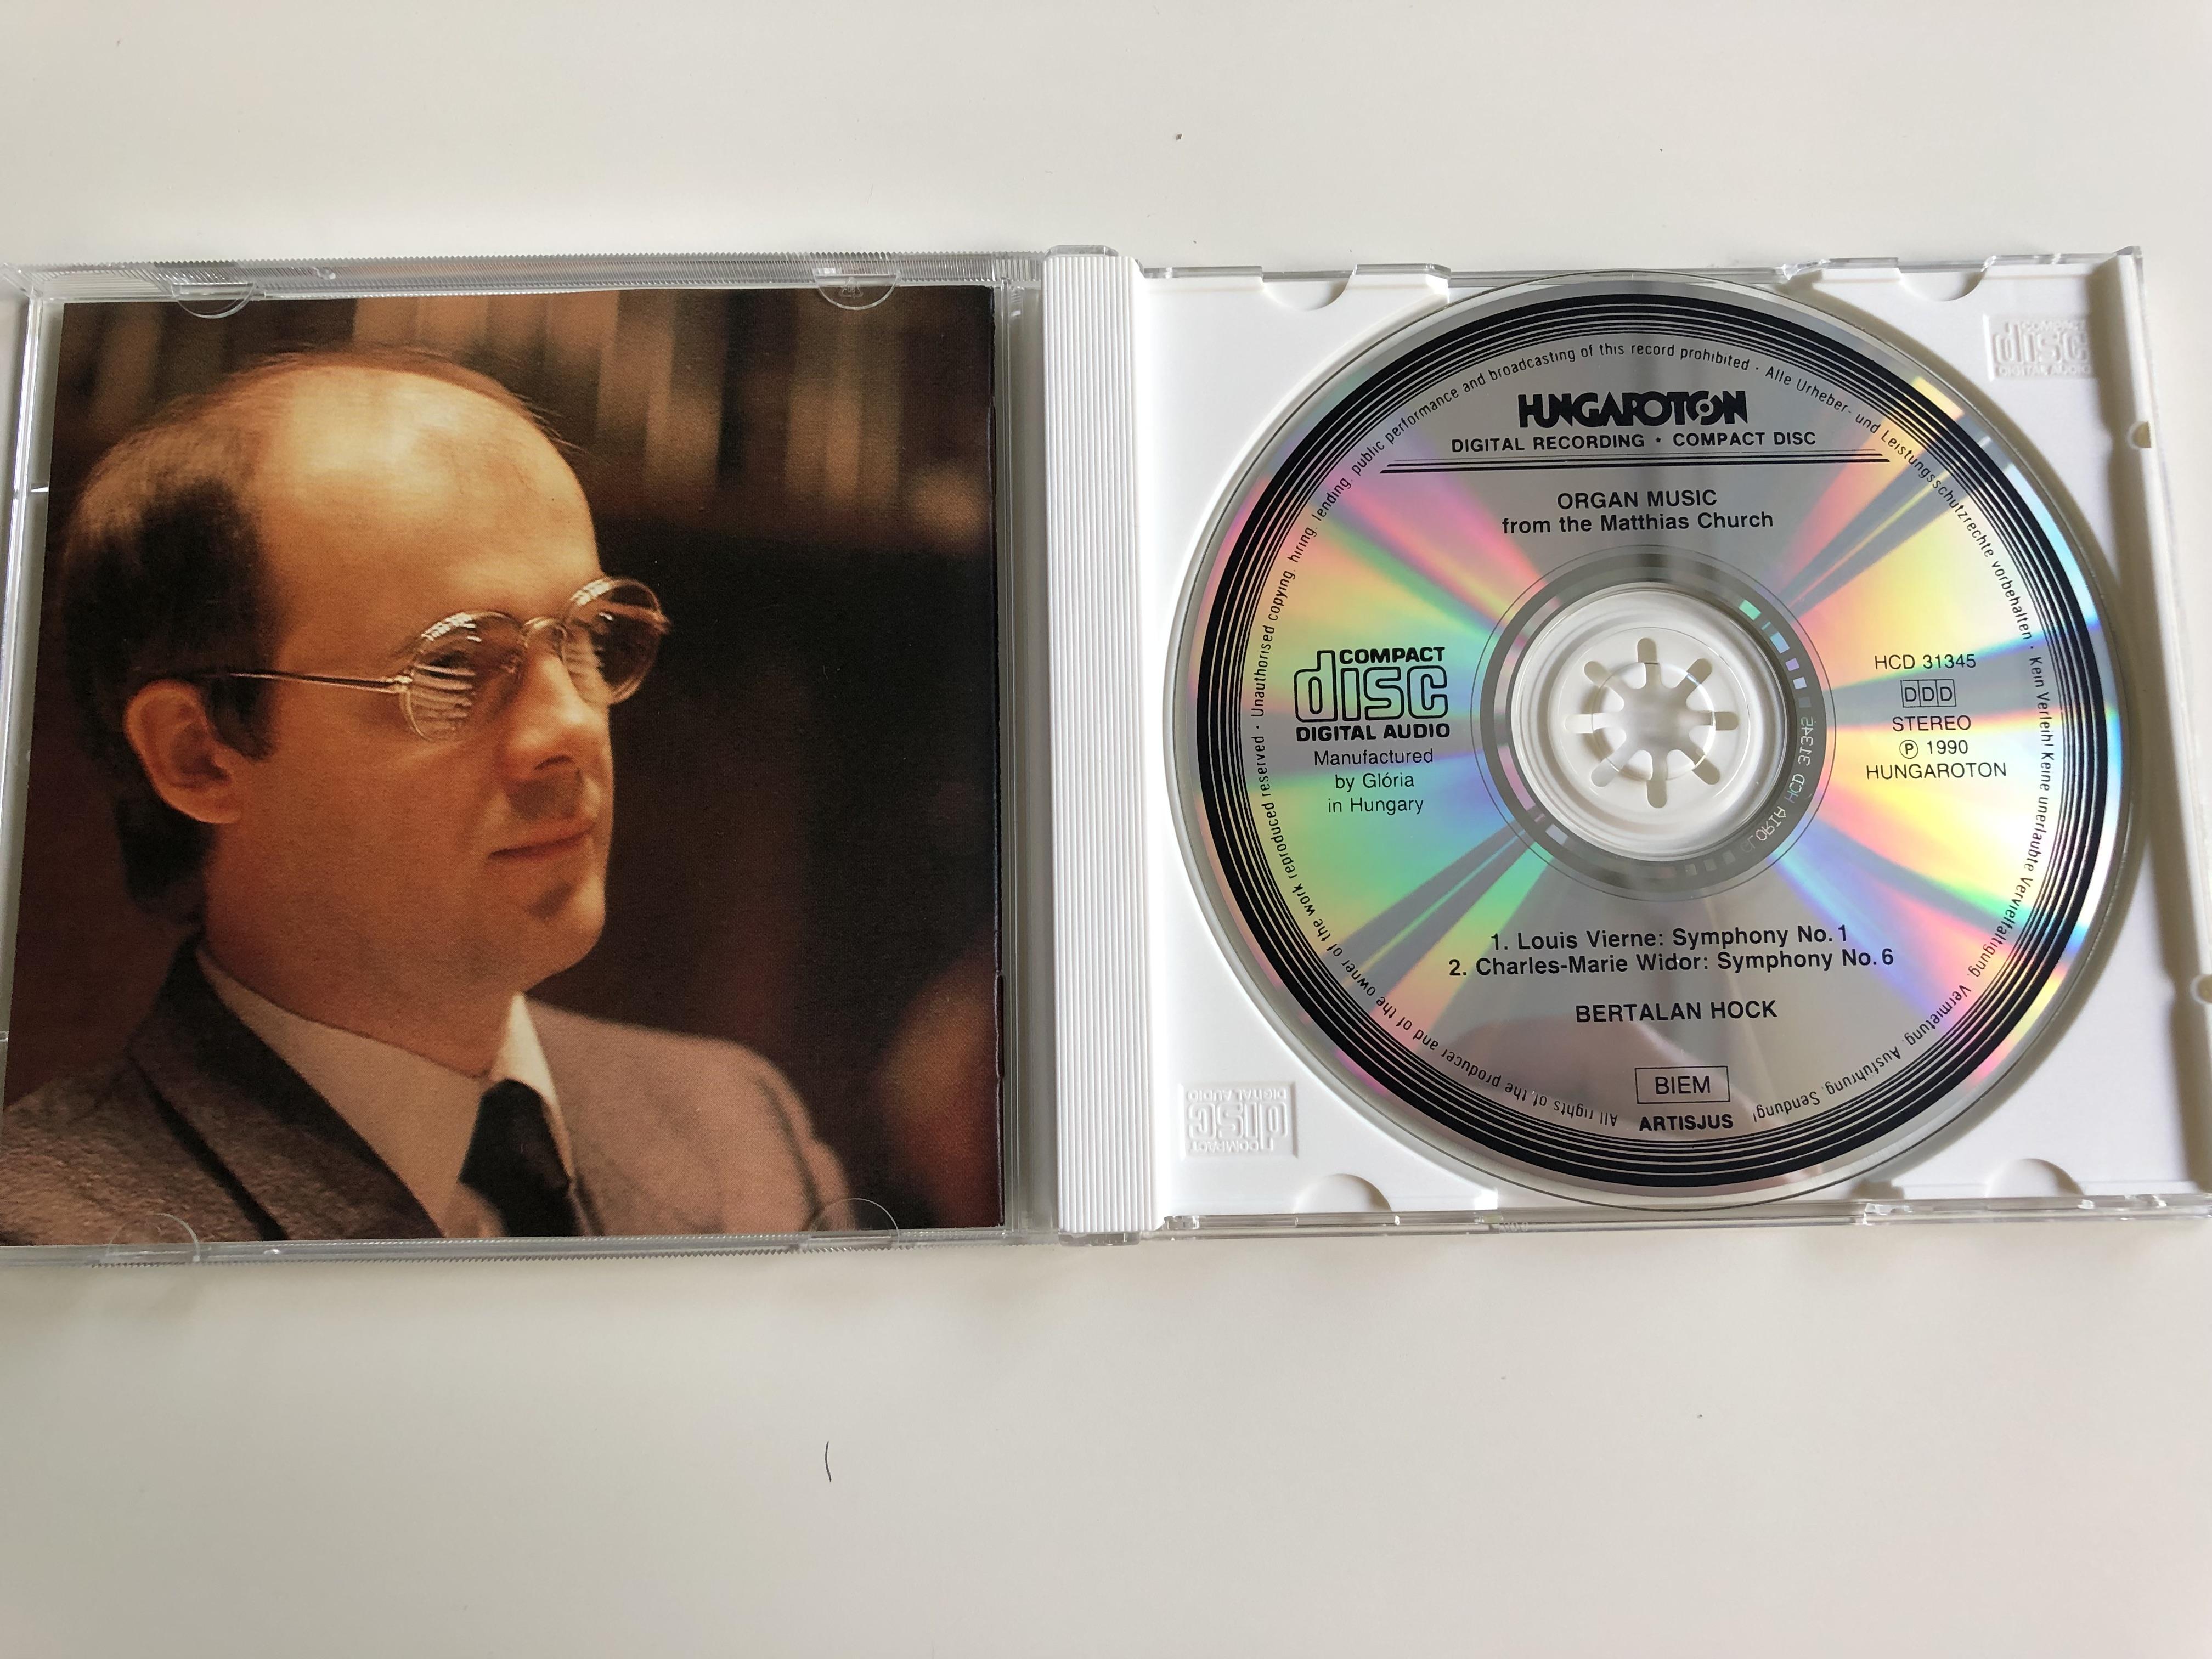 organ-music-from-the-matthias-church-louis-vierne-symphony-no.-1-charles-marie-widor-symphony-no.-6-bertalan-hock-audio-cd-1999-hungaroton-hcd-31345-6-.jpg